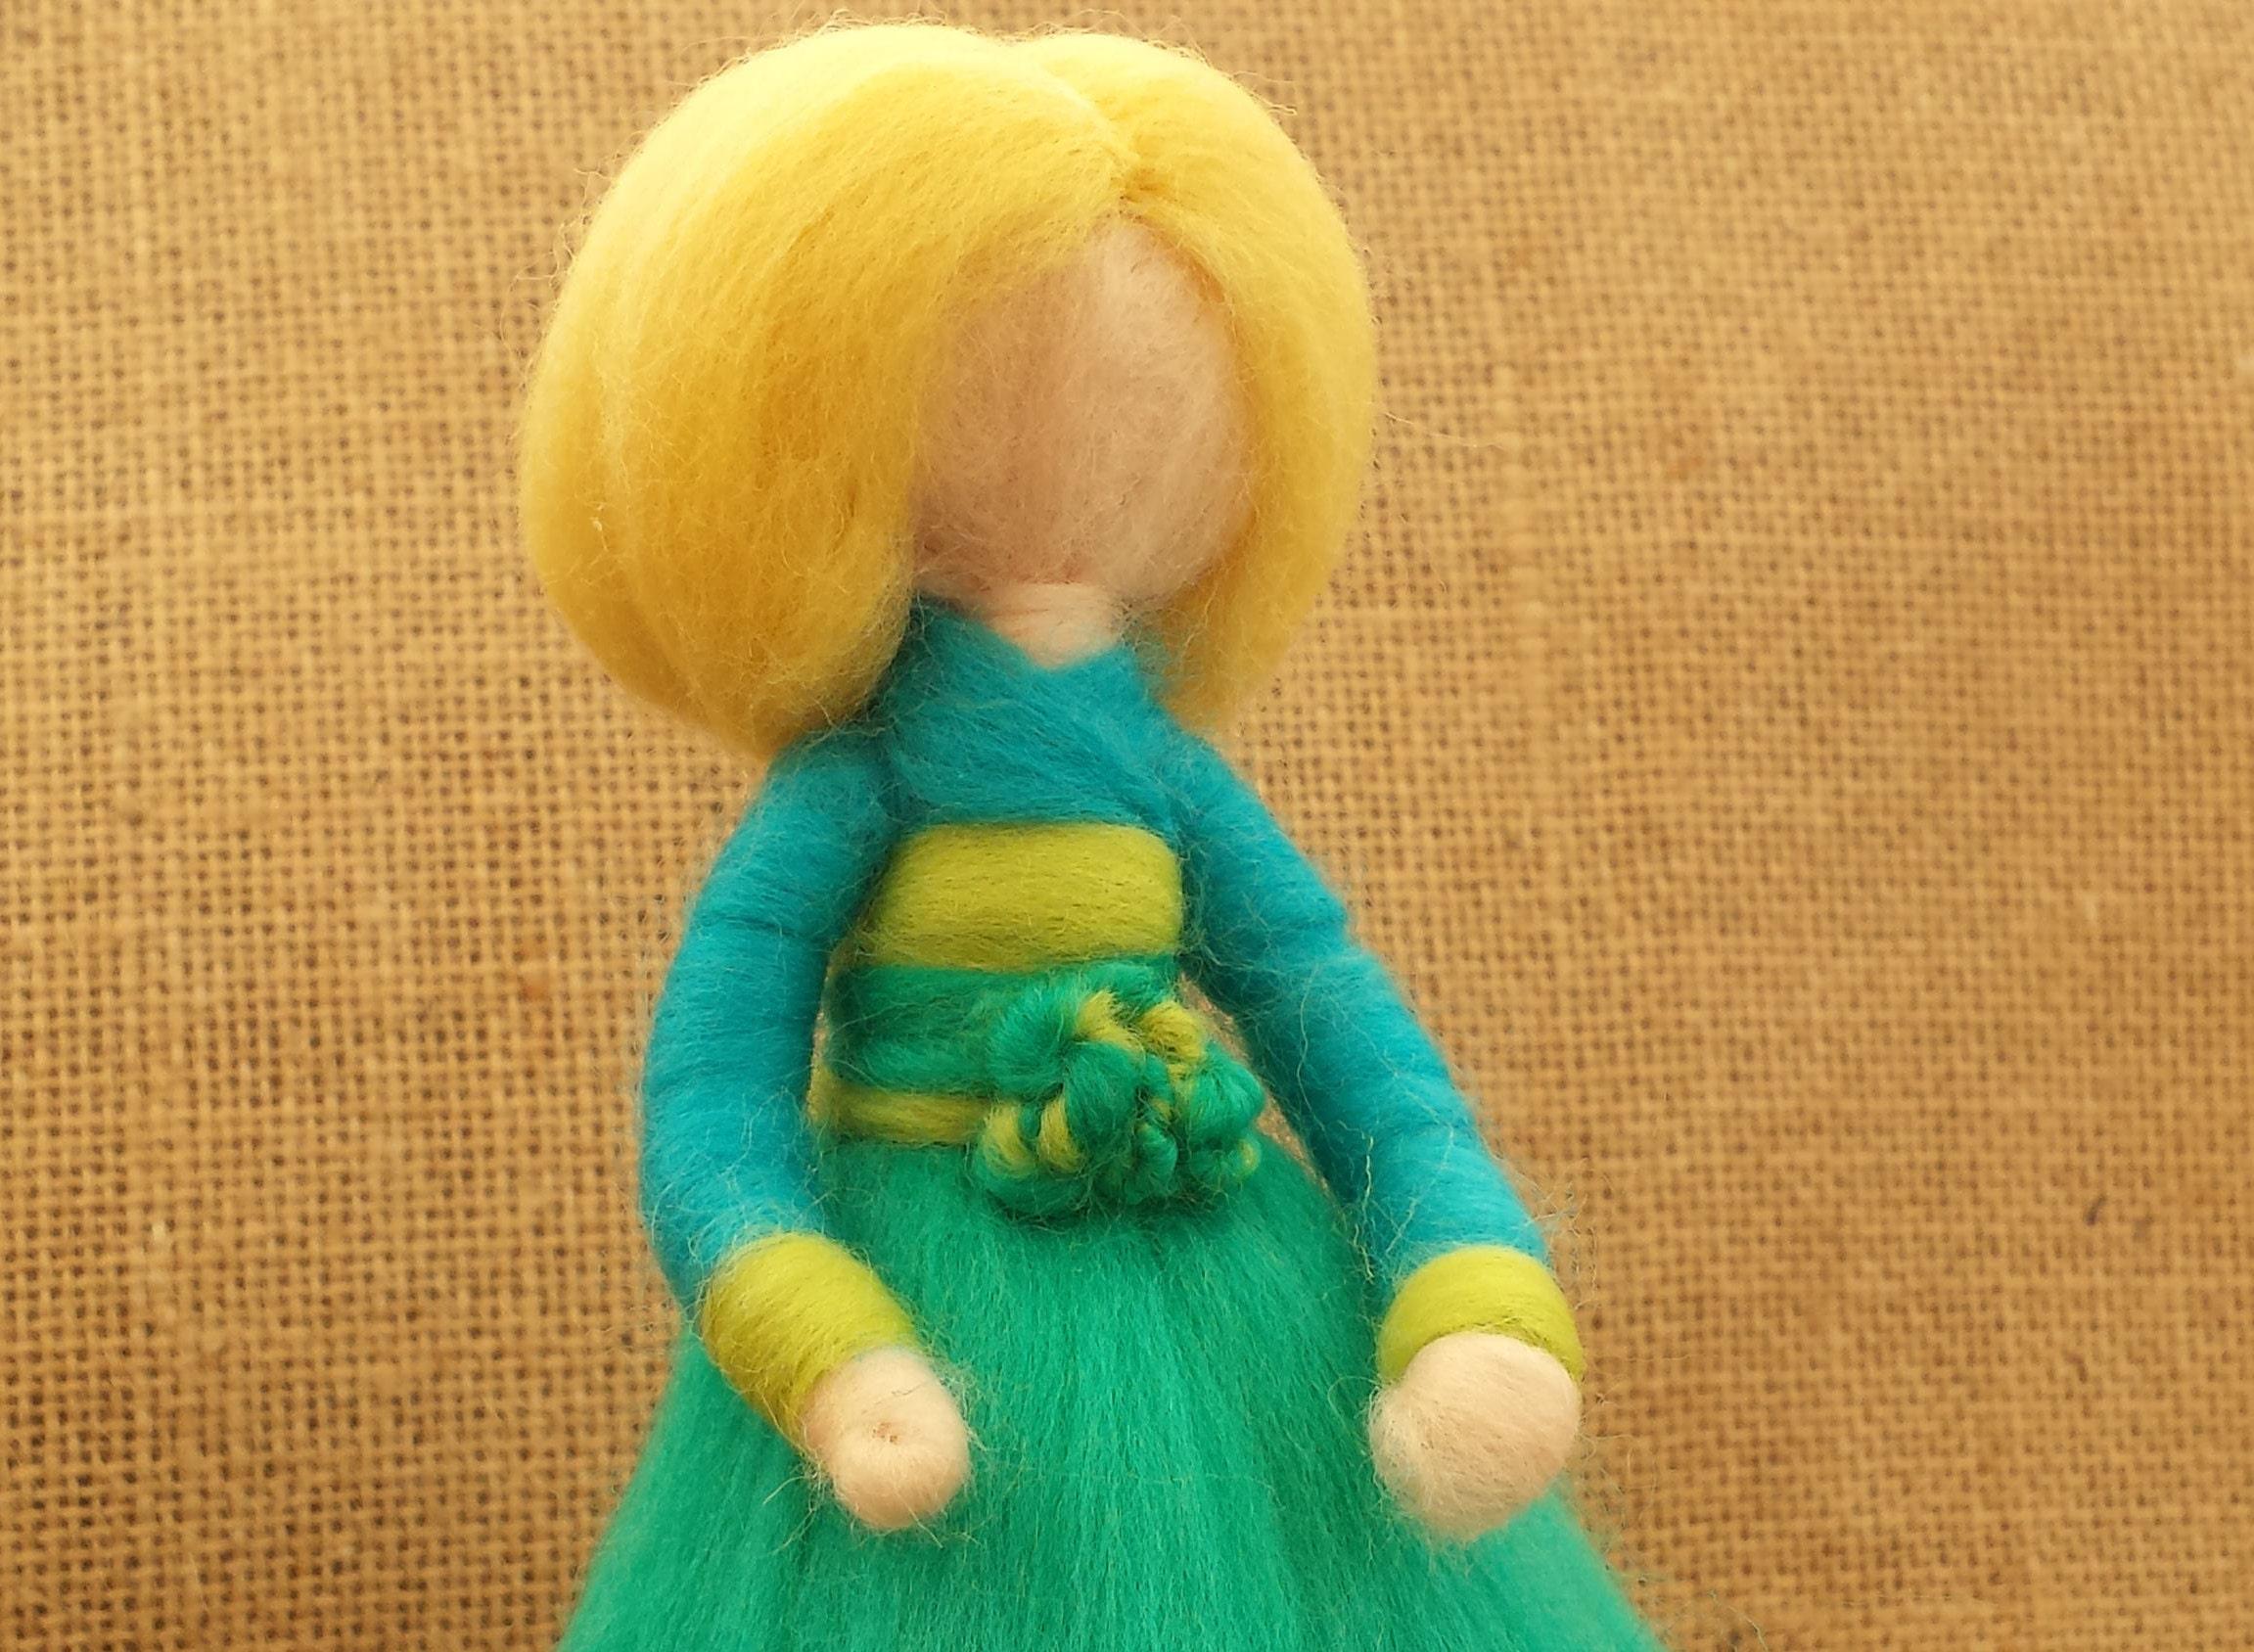 Needle Felt Fairy Waldorf Inspired Turquoise and Green figure Miniature Angel Ornament Felted Fairytail Doll Faerie Fairie